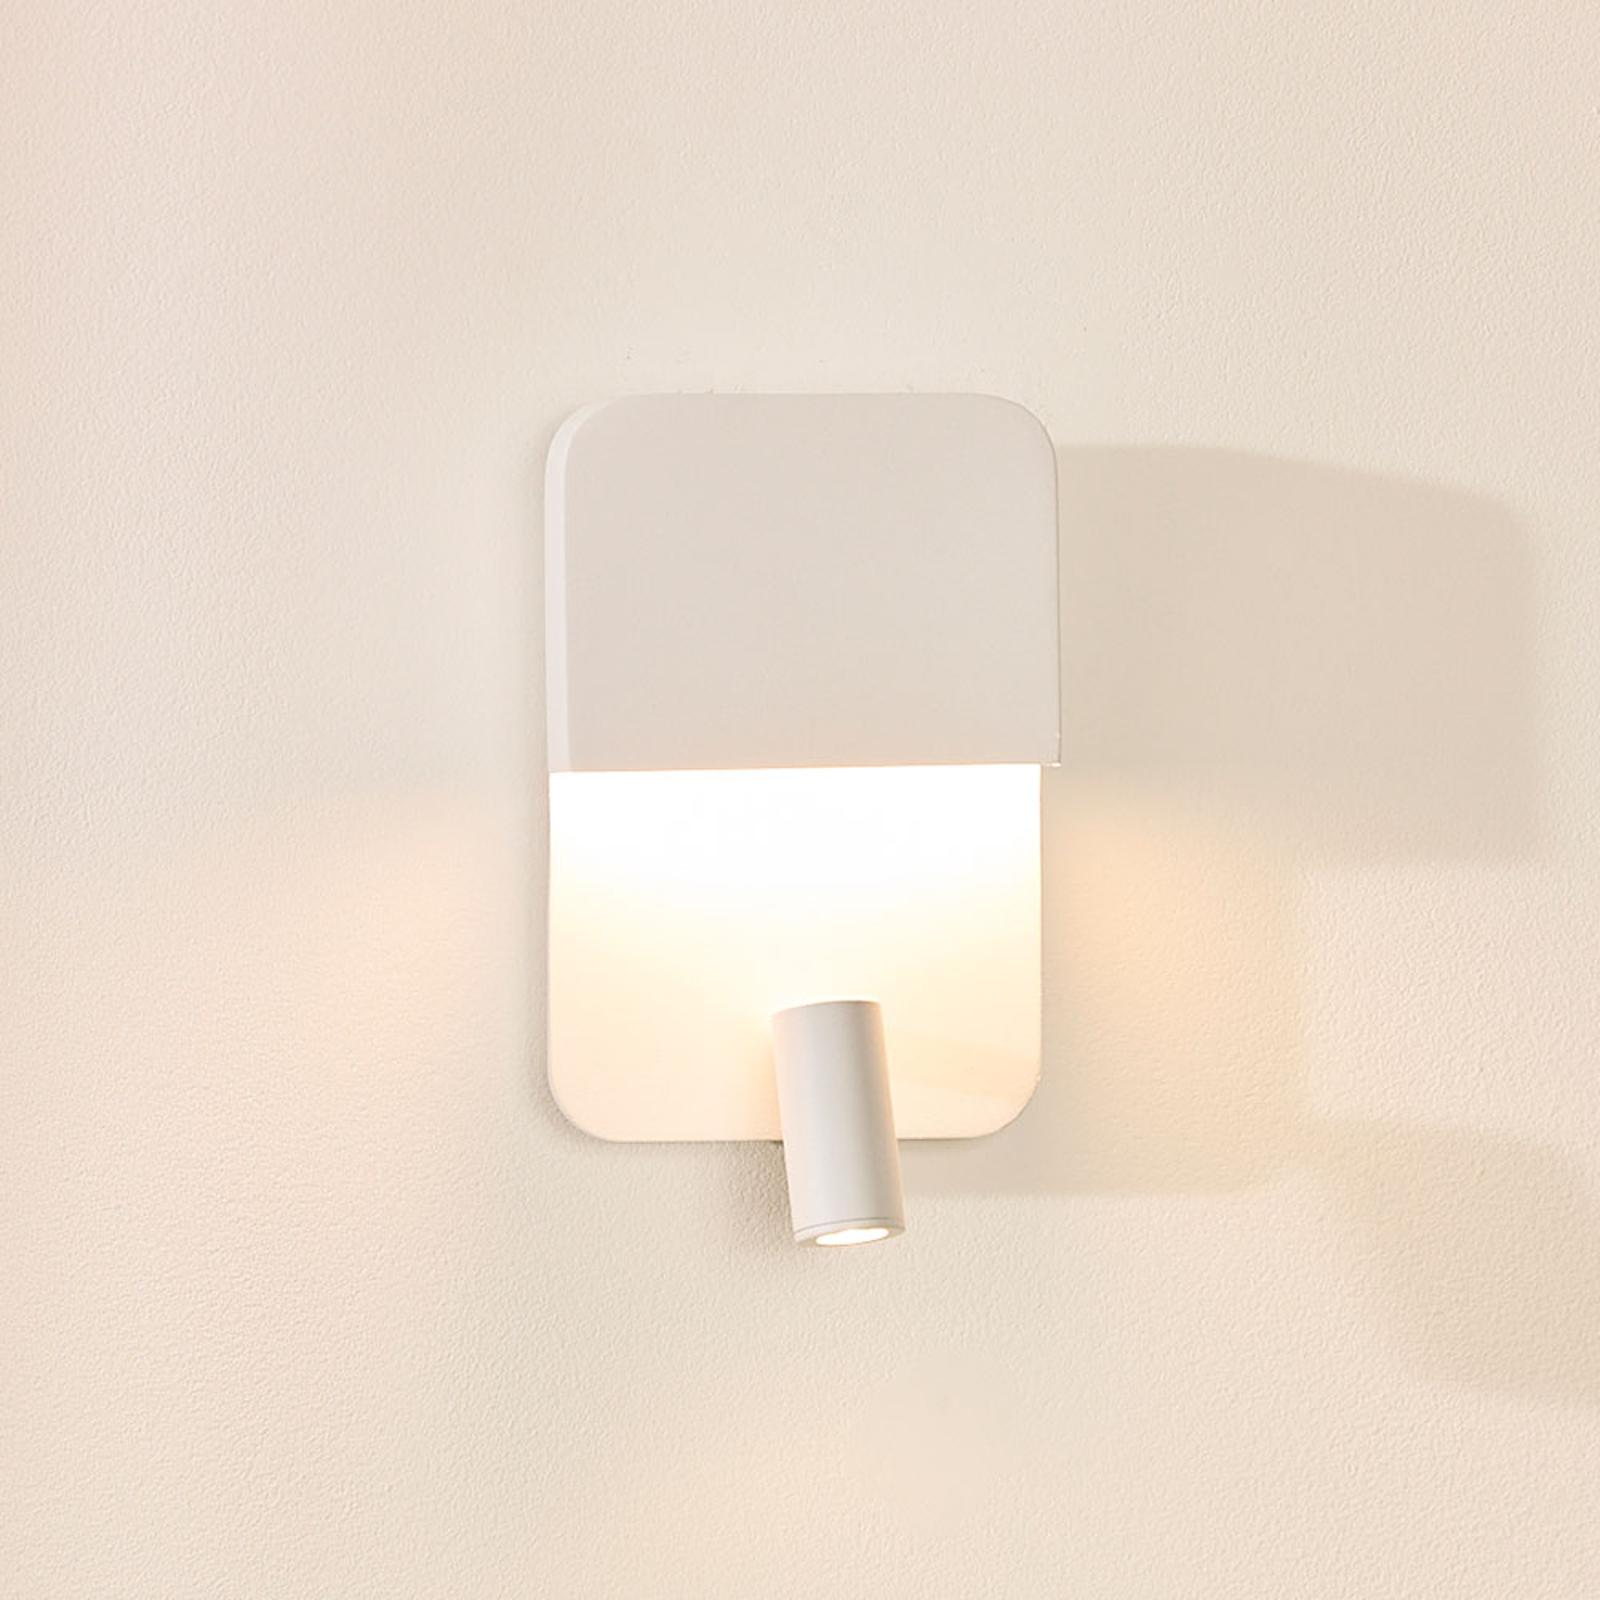 LED-Wandleuchte Boxer mit Spot, weiß